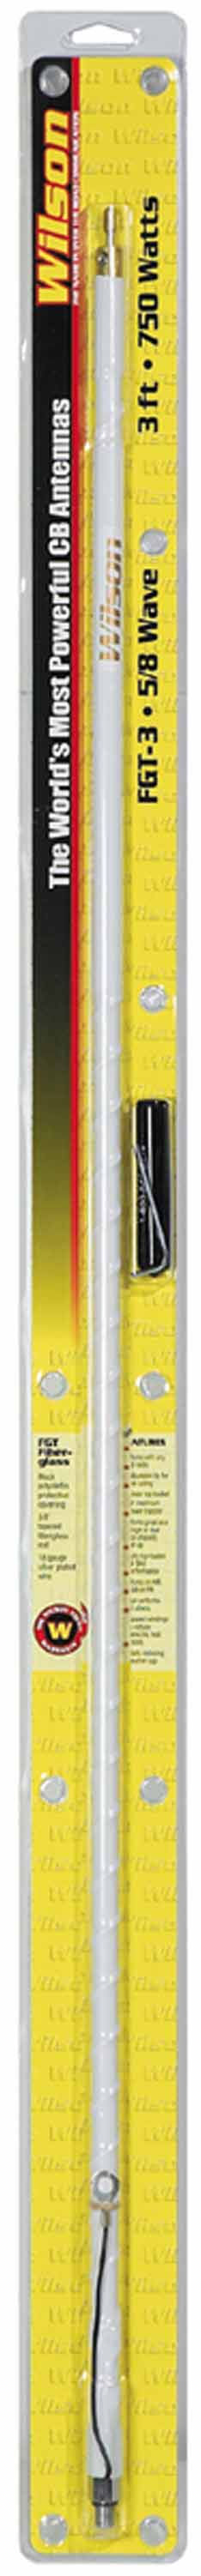 WFGT3-W - Wilson 3' Tunable Tip White CB Antenna w/Ground Strap, Silver Load